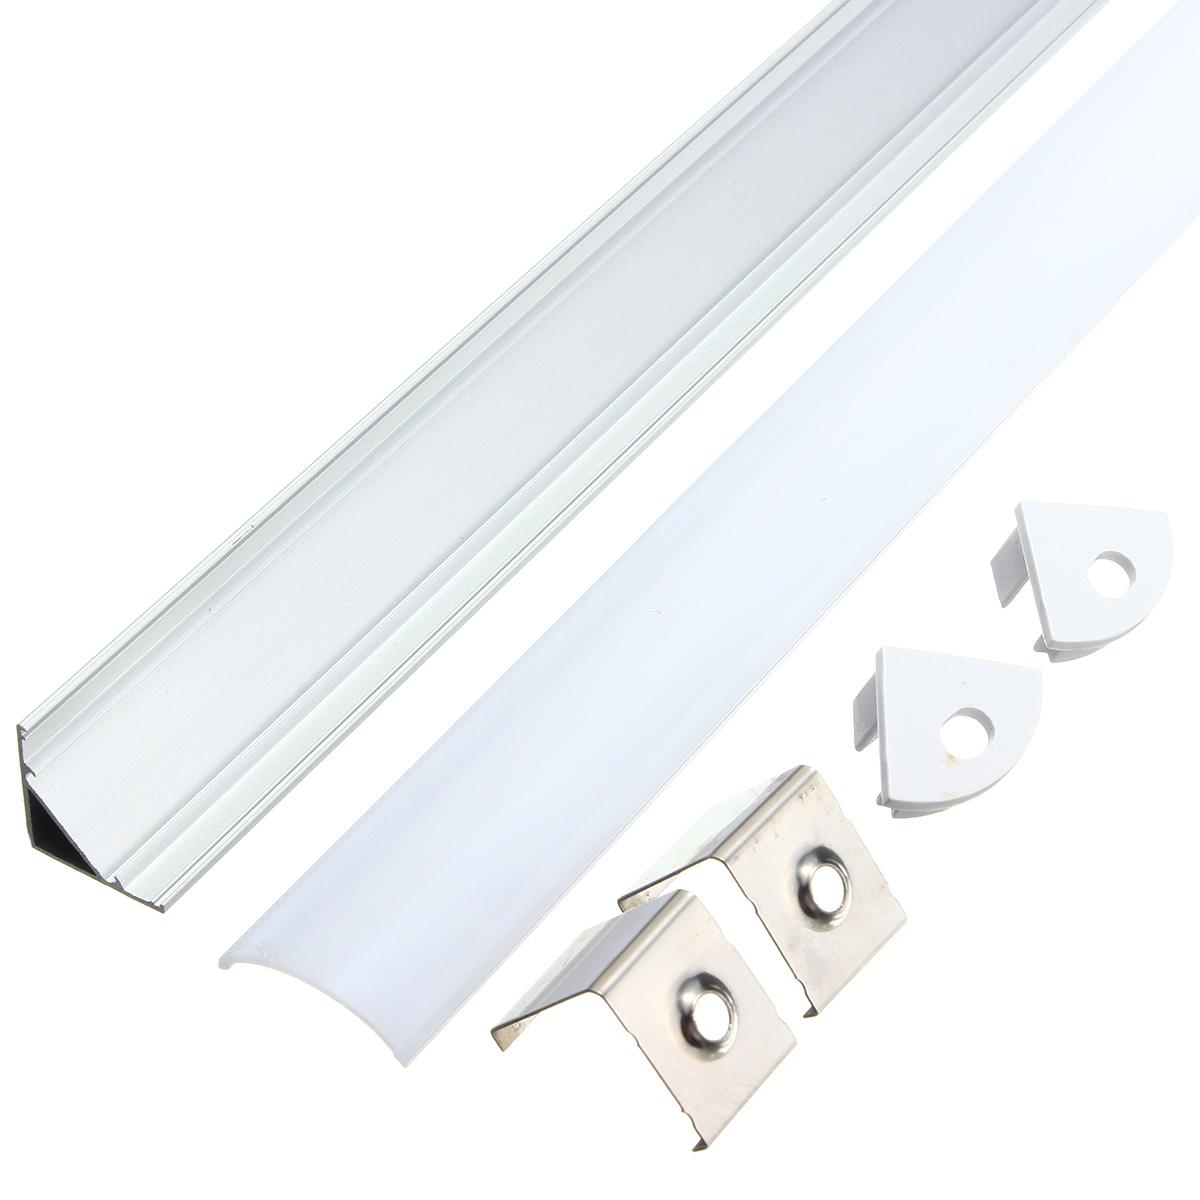 30-50cm-U-V-YW-Aluminum-Bar-Canal-Holder-Couverture-Pour-Bande-LED-Strip-Light